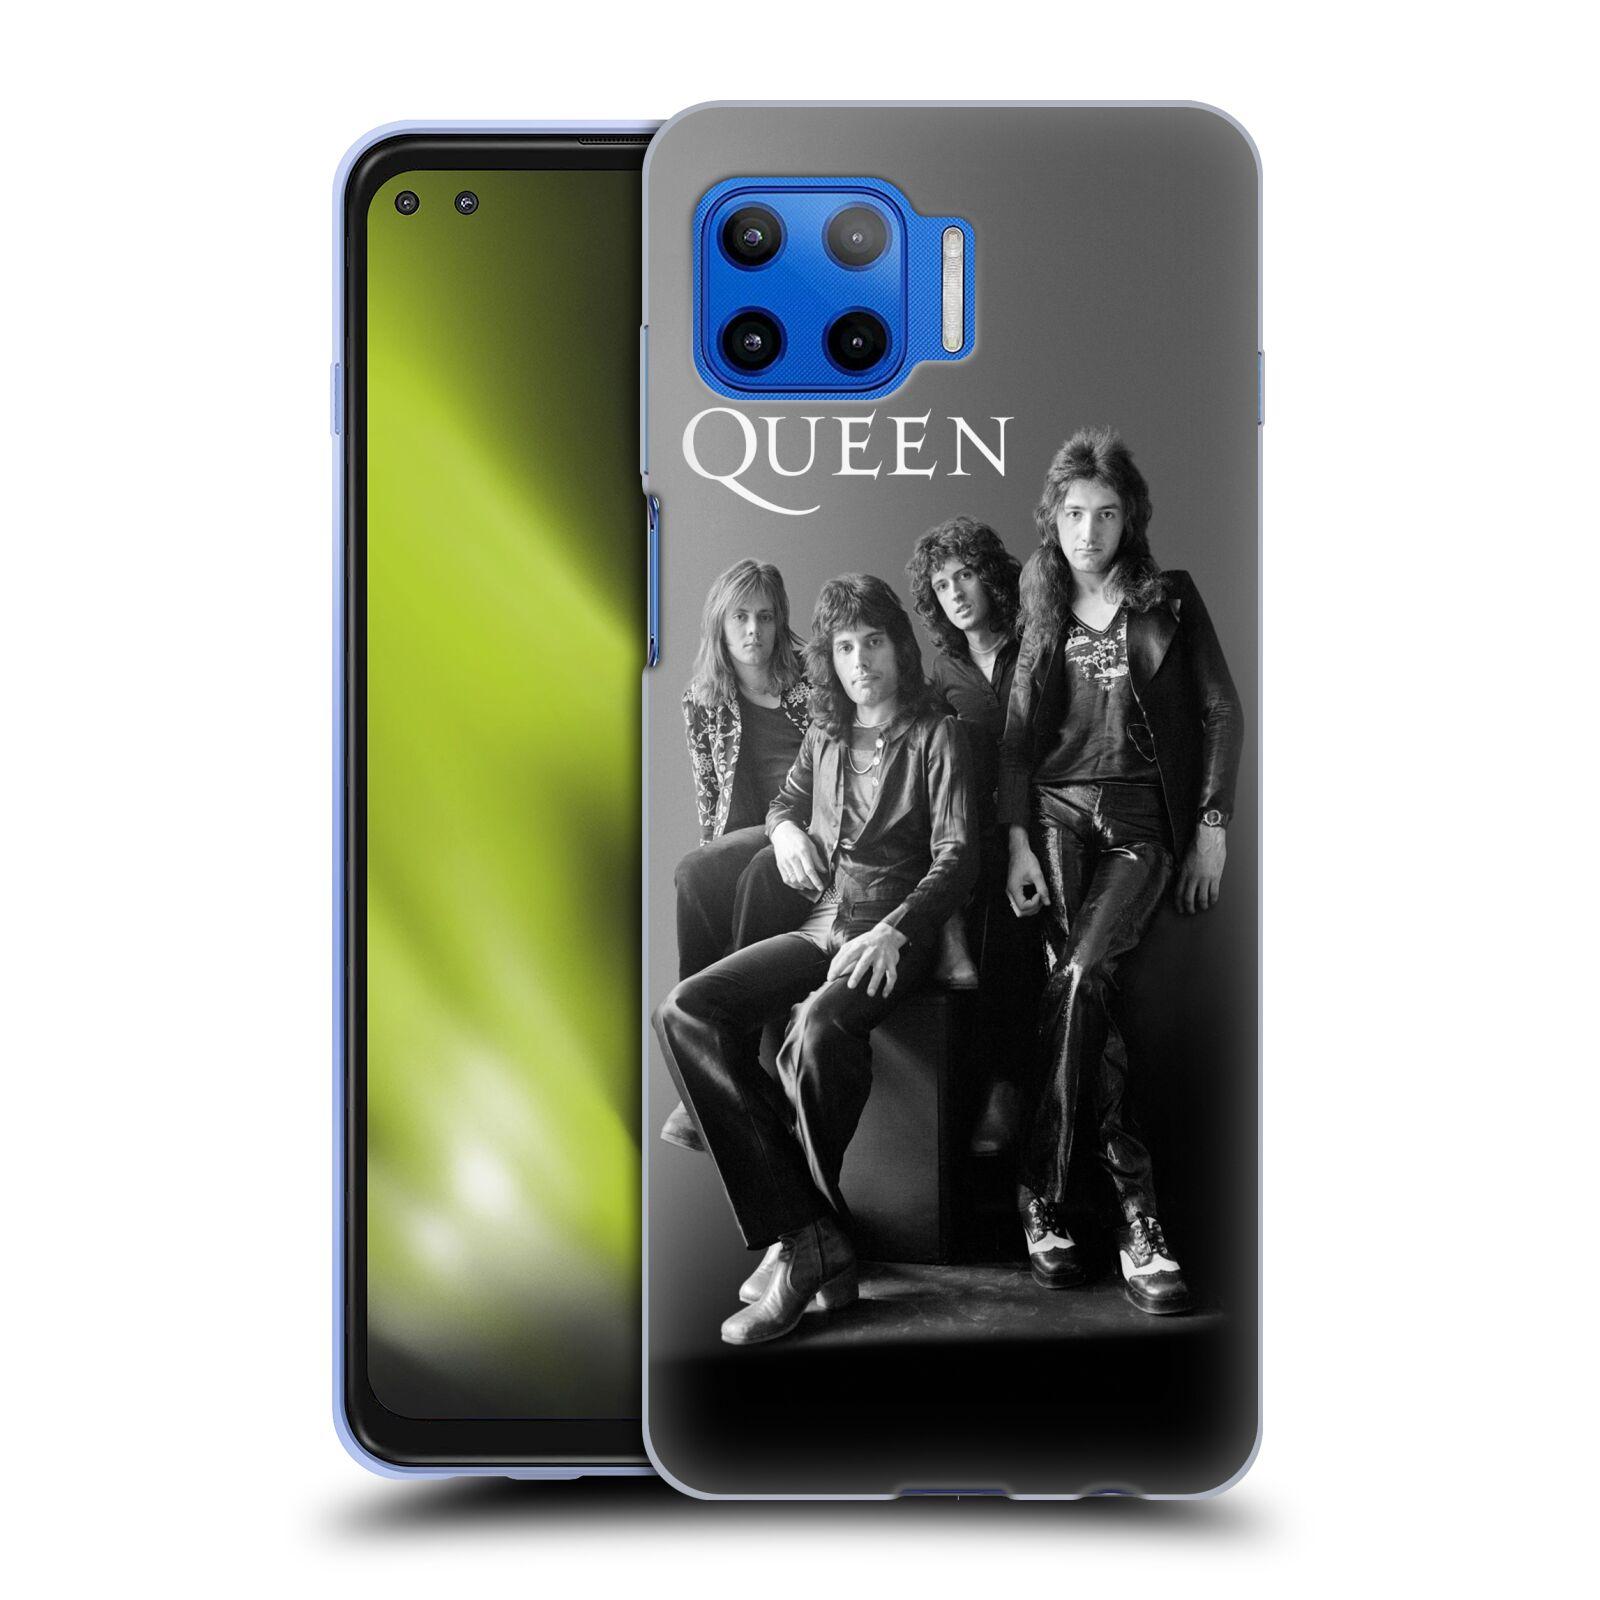 Silikonové pouzdro na mobil Motorola Moto G 5G Plus - Head Case - Queen - Skupina